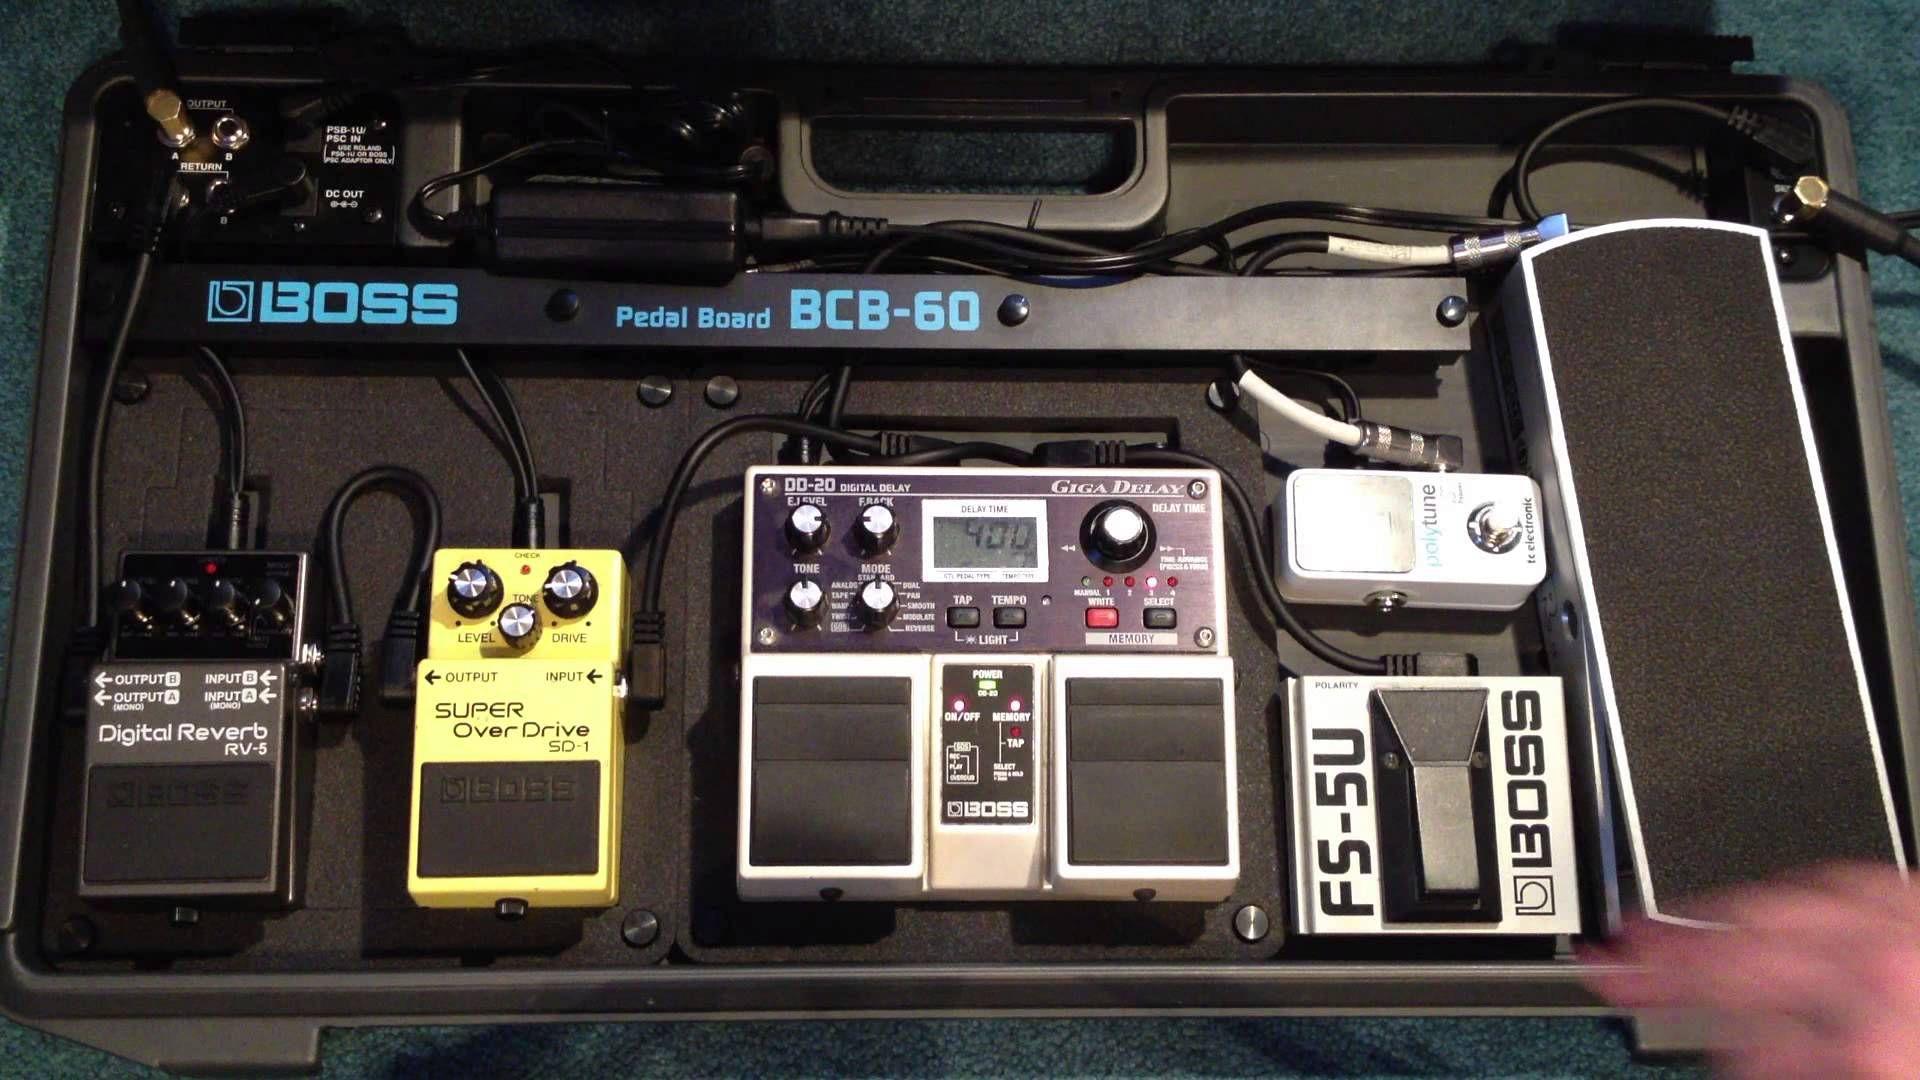 pedalboard essentials music pedalboard guitar pedals boss pedals. Black Bedroom Furniture Sets. Home Design Ideas